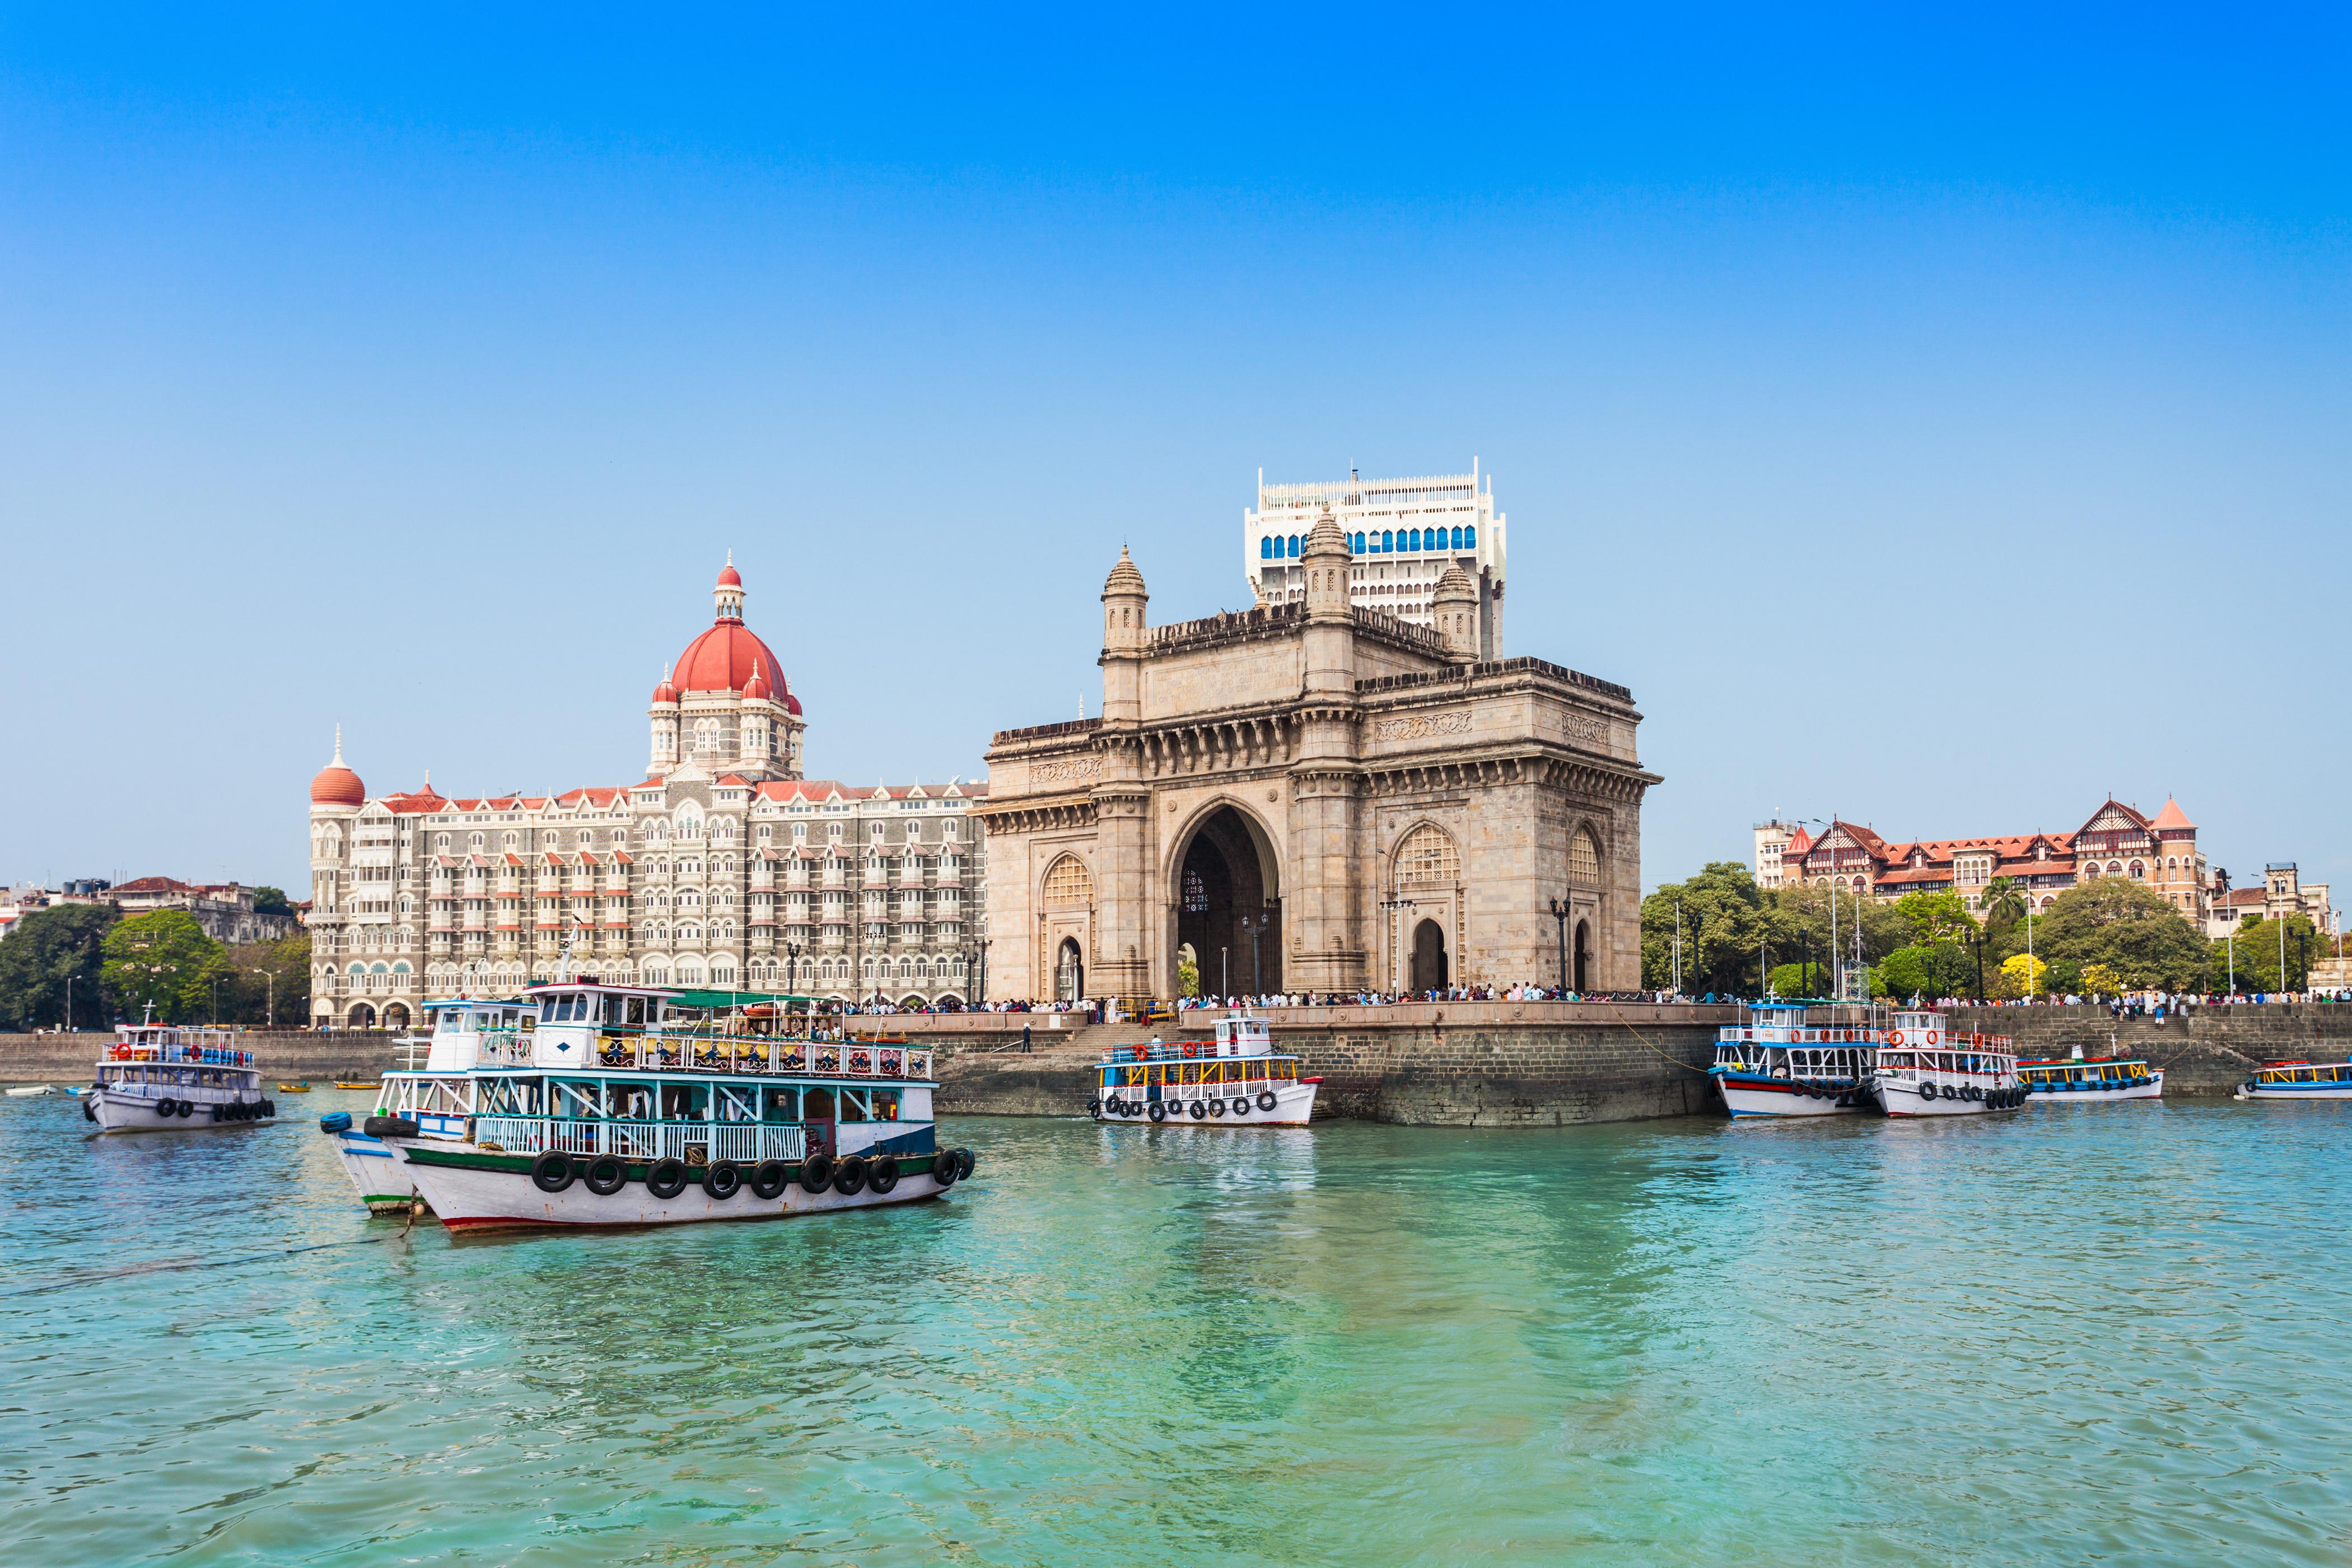 Taj Mahal Hotel e Gateway na India